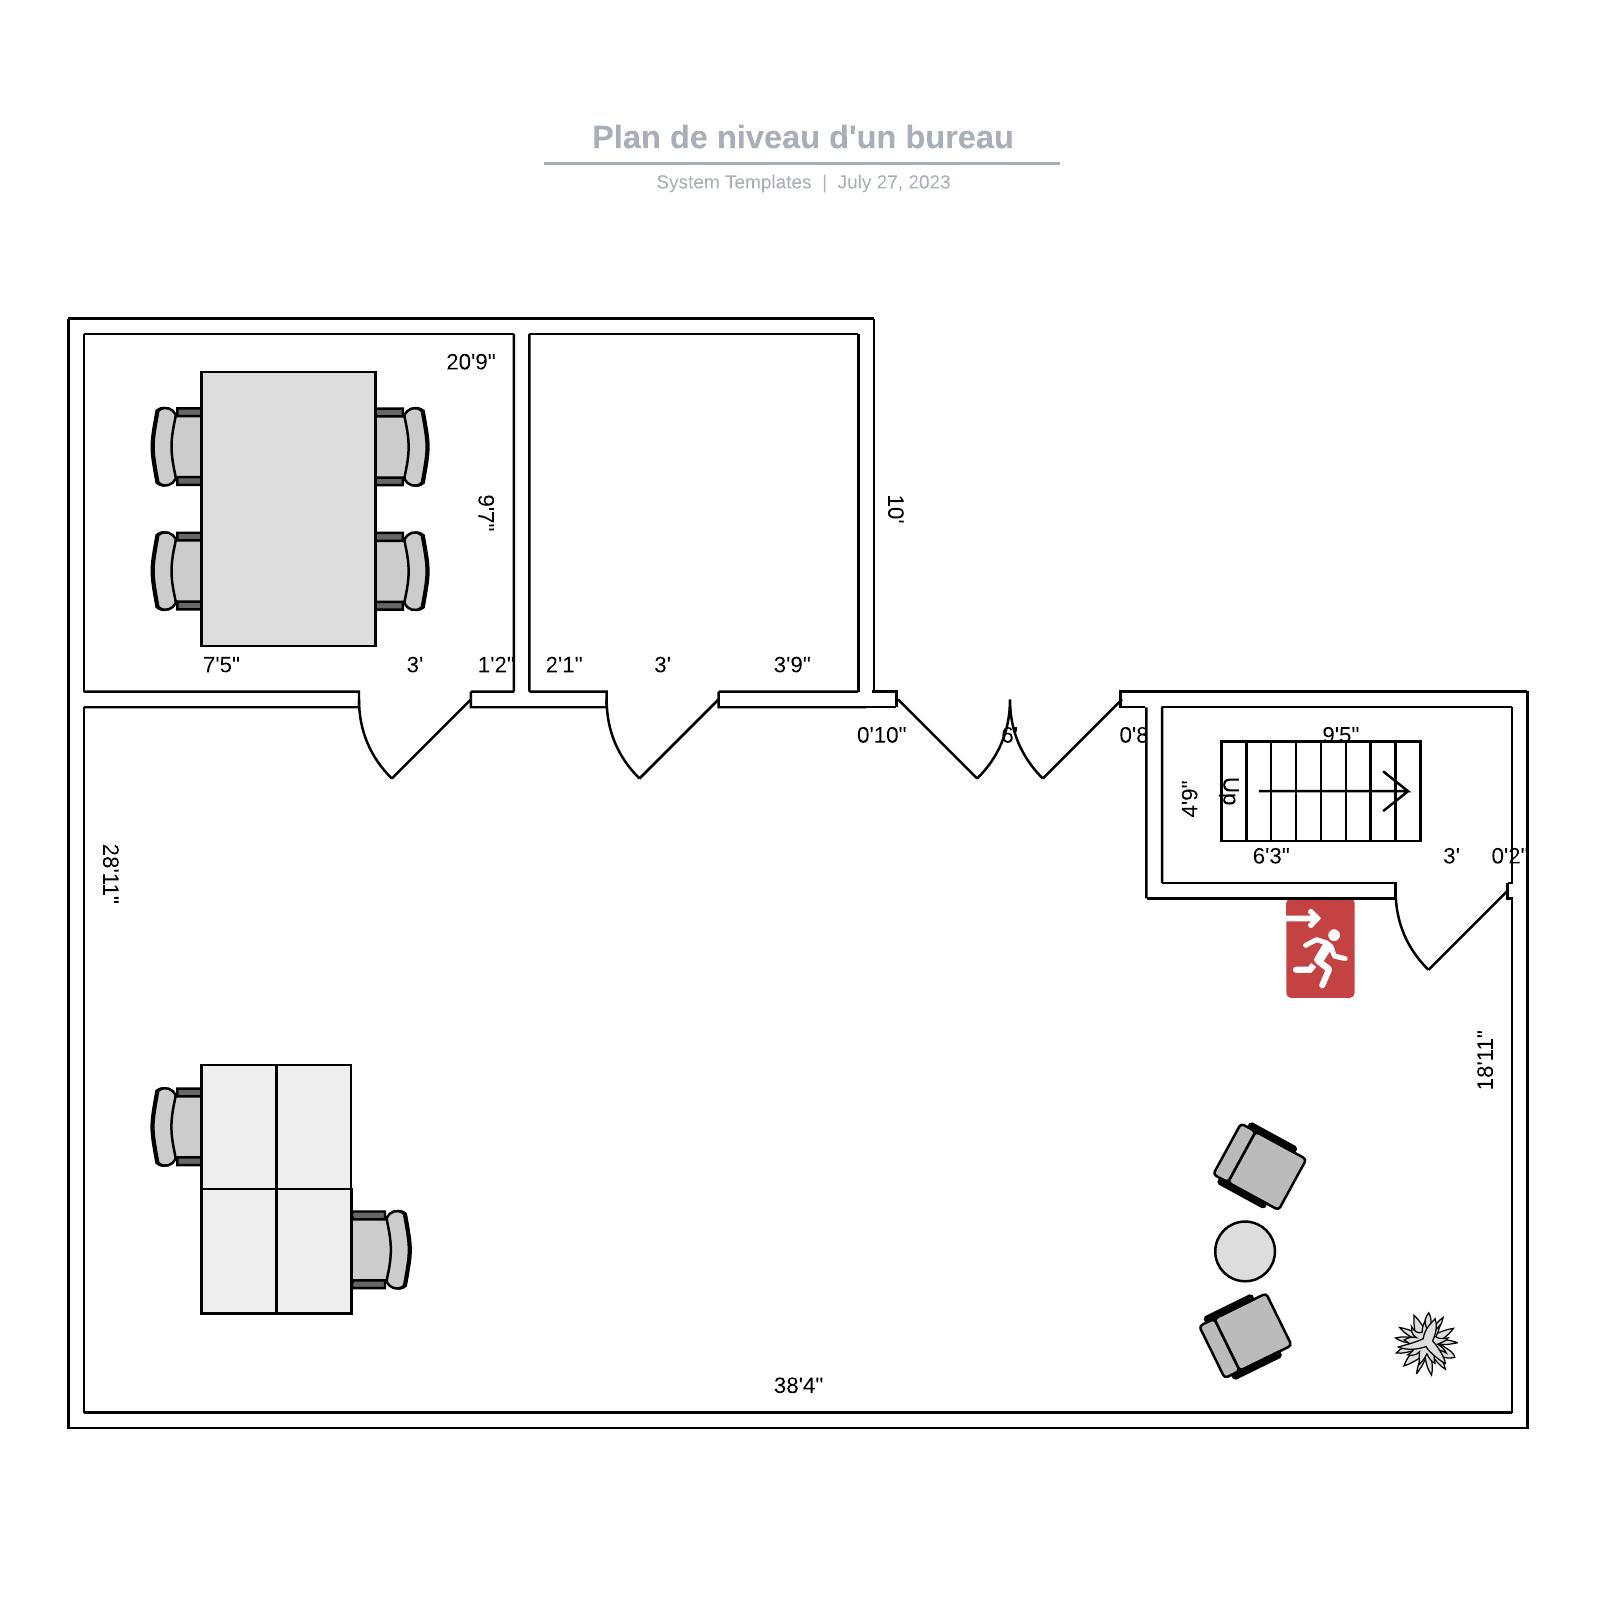 exemple de plan de niveau d'un bureau 2